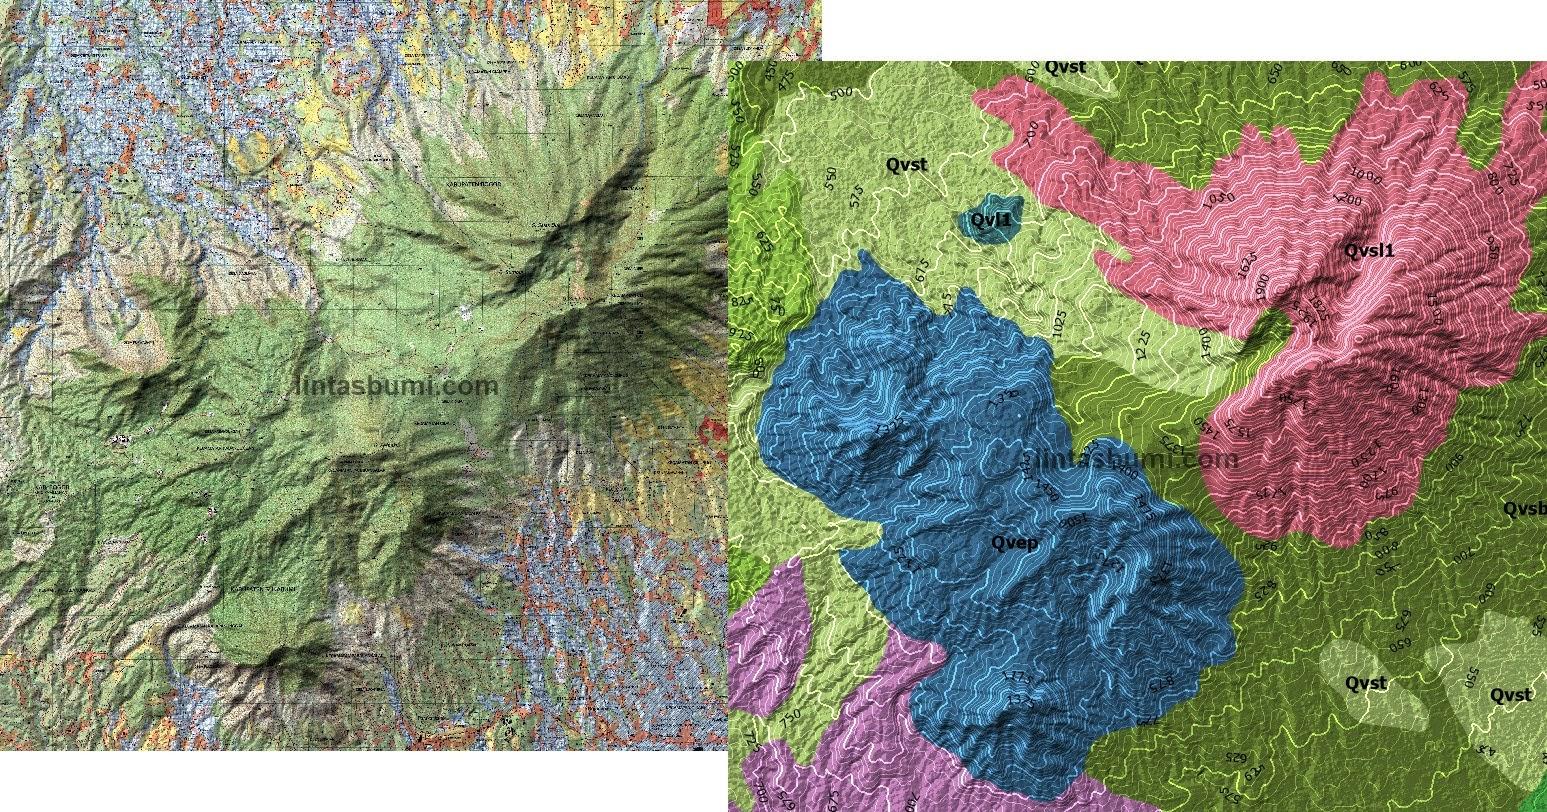 'More Hilly' Hillshade : Komparasi Blend Layer Di Global Mapper dan ArcGIS Pro